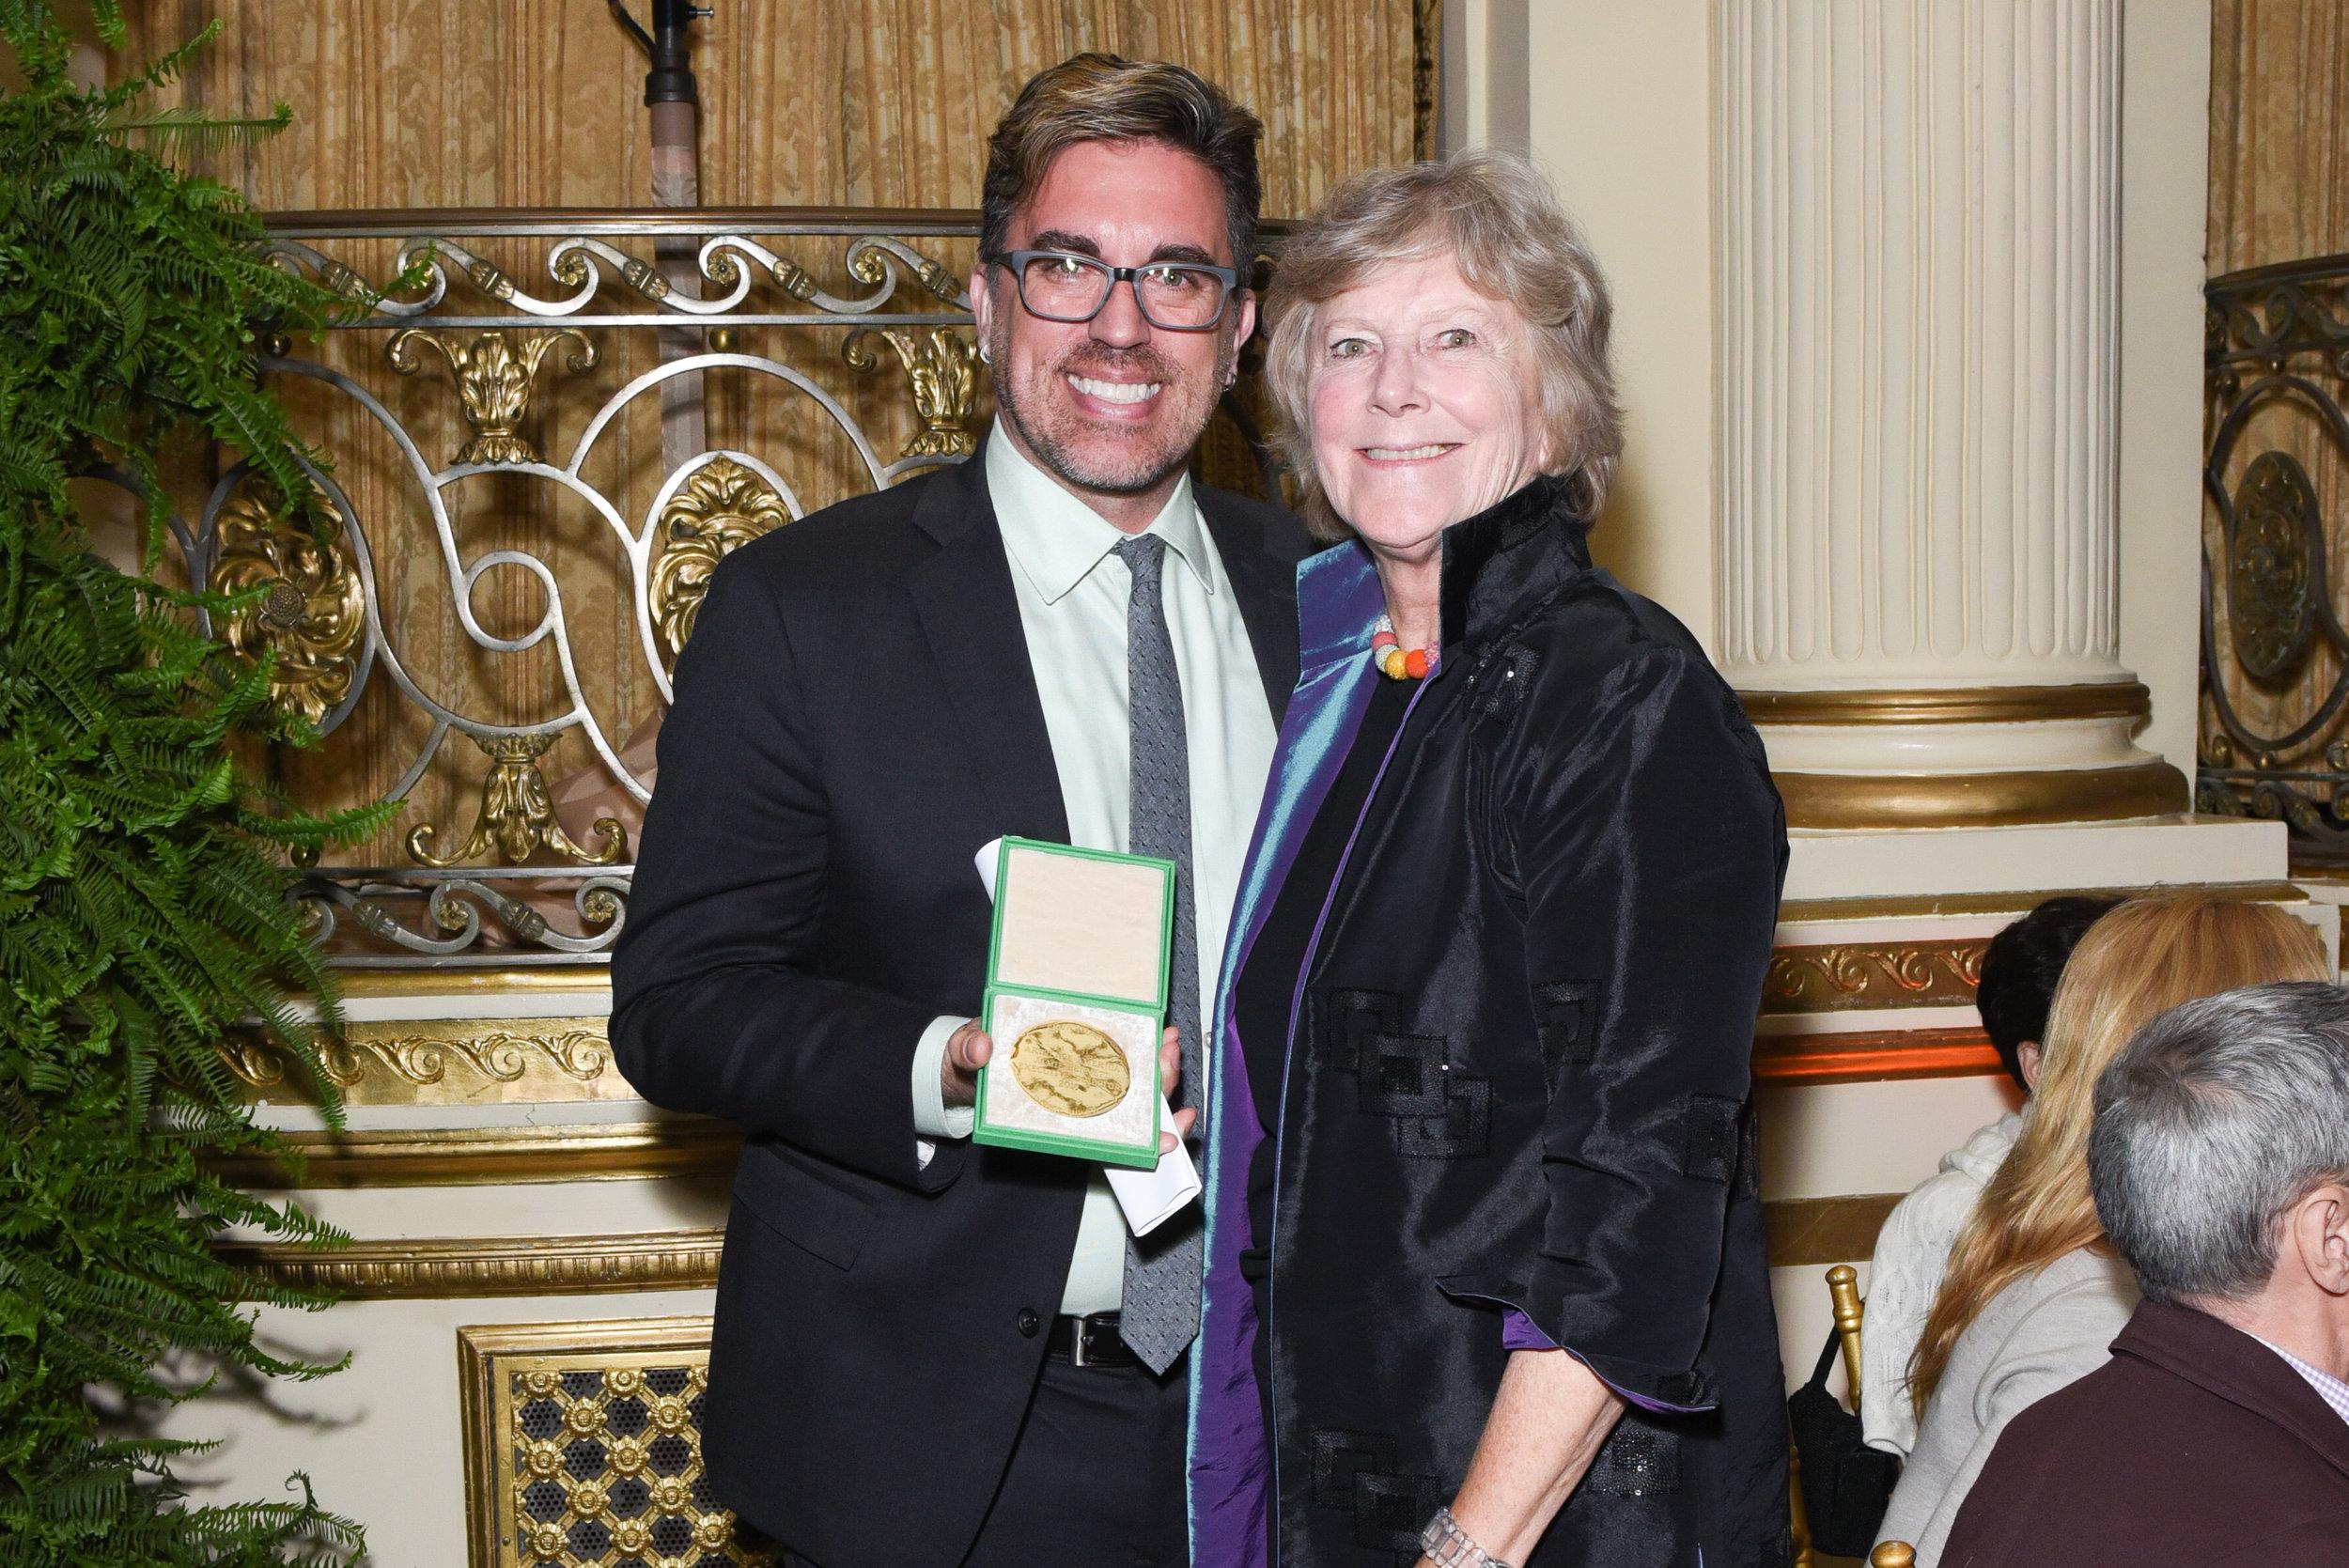 Jamie Bennett, Ann Gund==Skowhegan Awards Dinner 2018==The Plaza Hotel, New York, NY==April 24, 2018==�Patrick McMullan==Photo - Presley Ann/PMC====